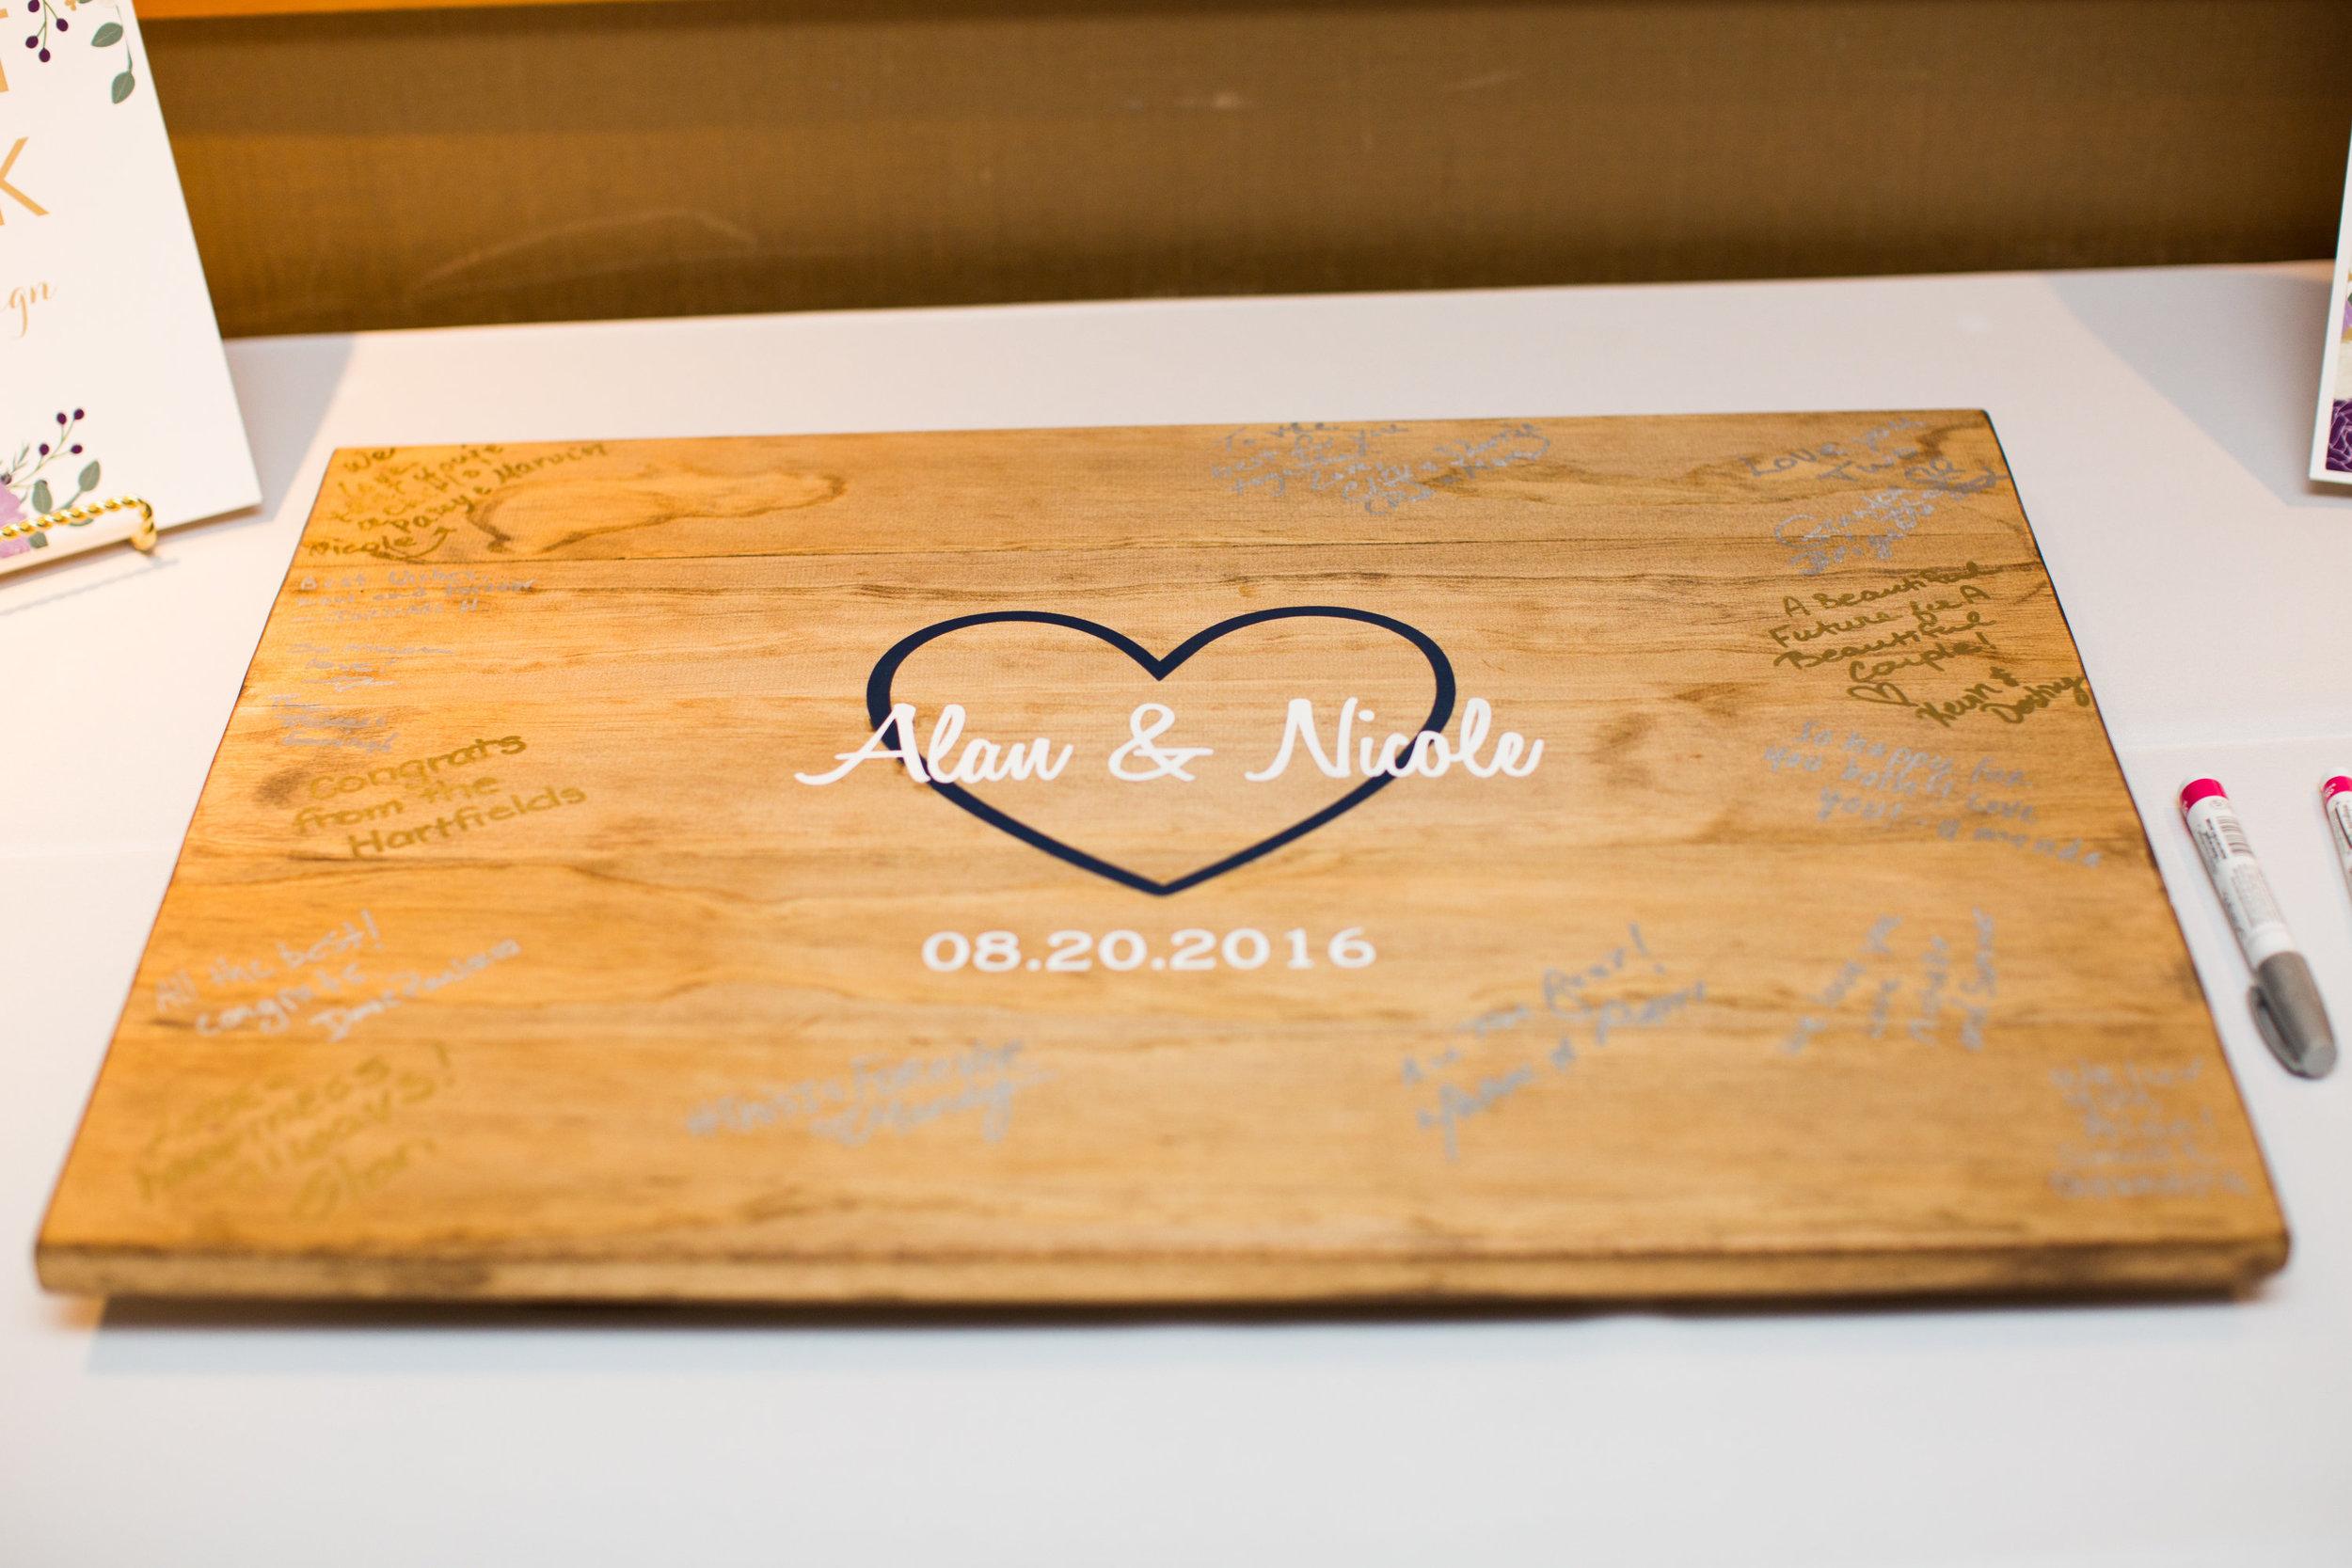 Seattle Wedding Planner, Wedding Wise | Ciccarelli Photography | Edgewater Hotel Wedding | Wedding guestbook alternative